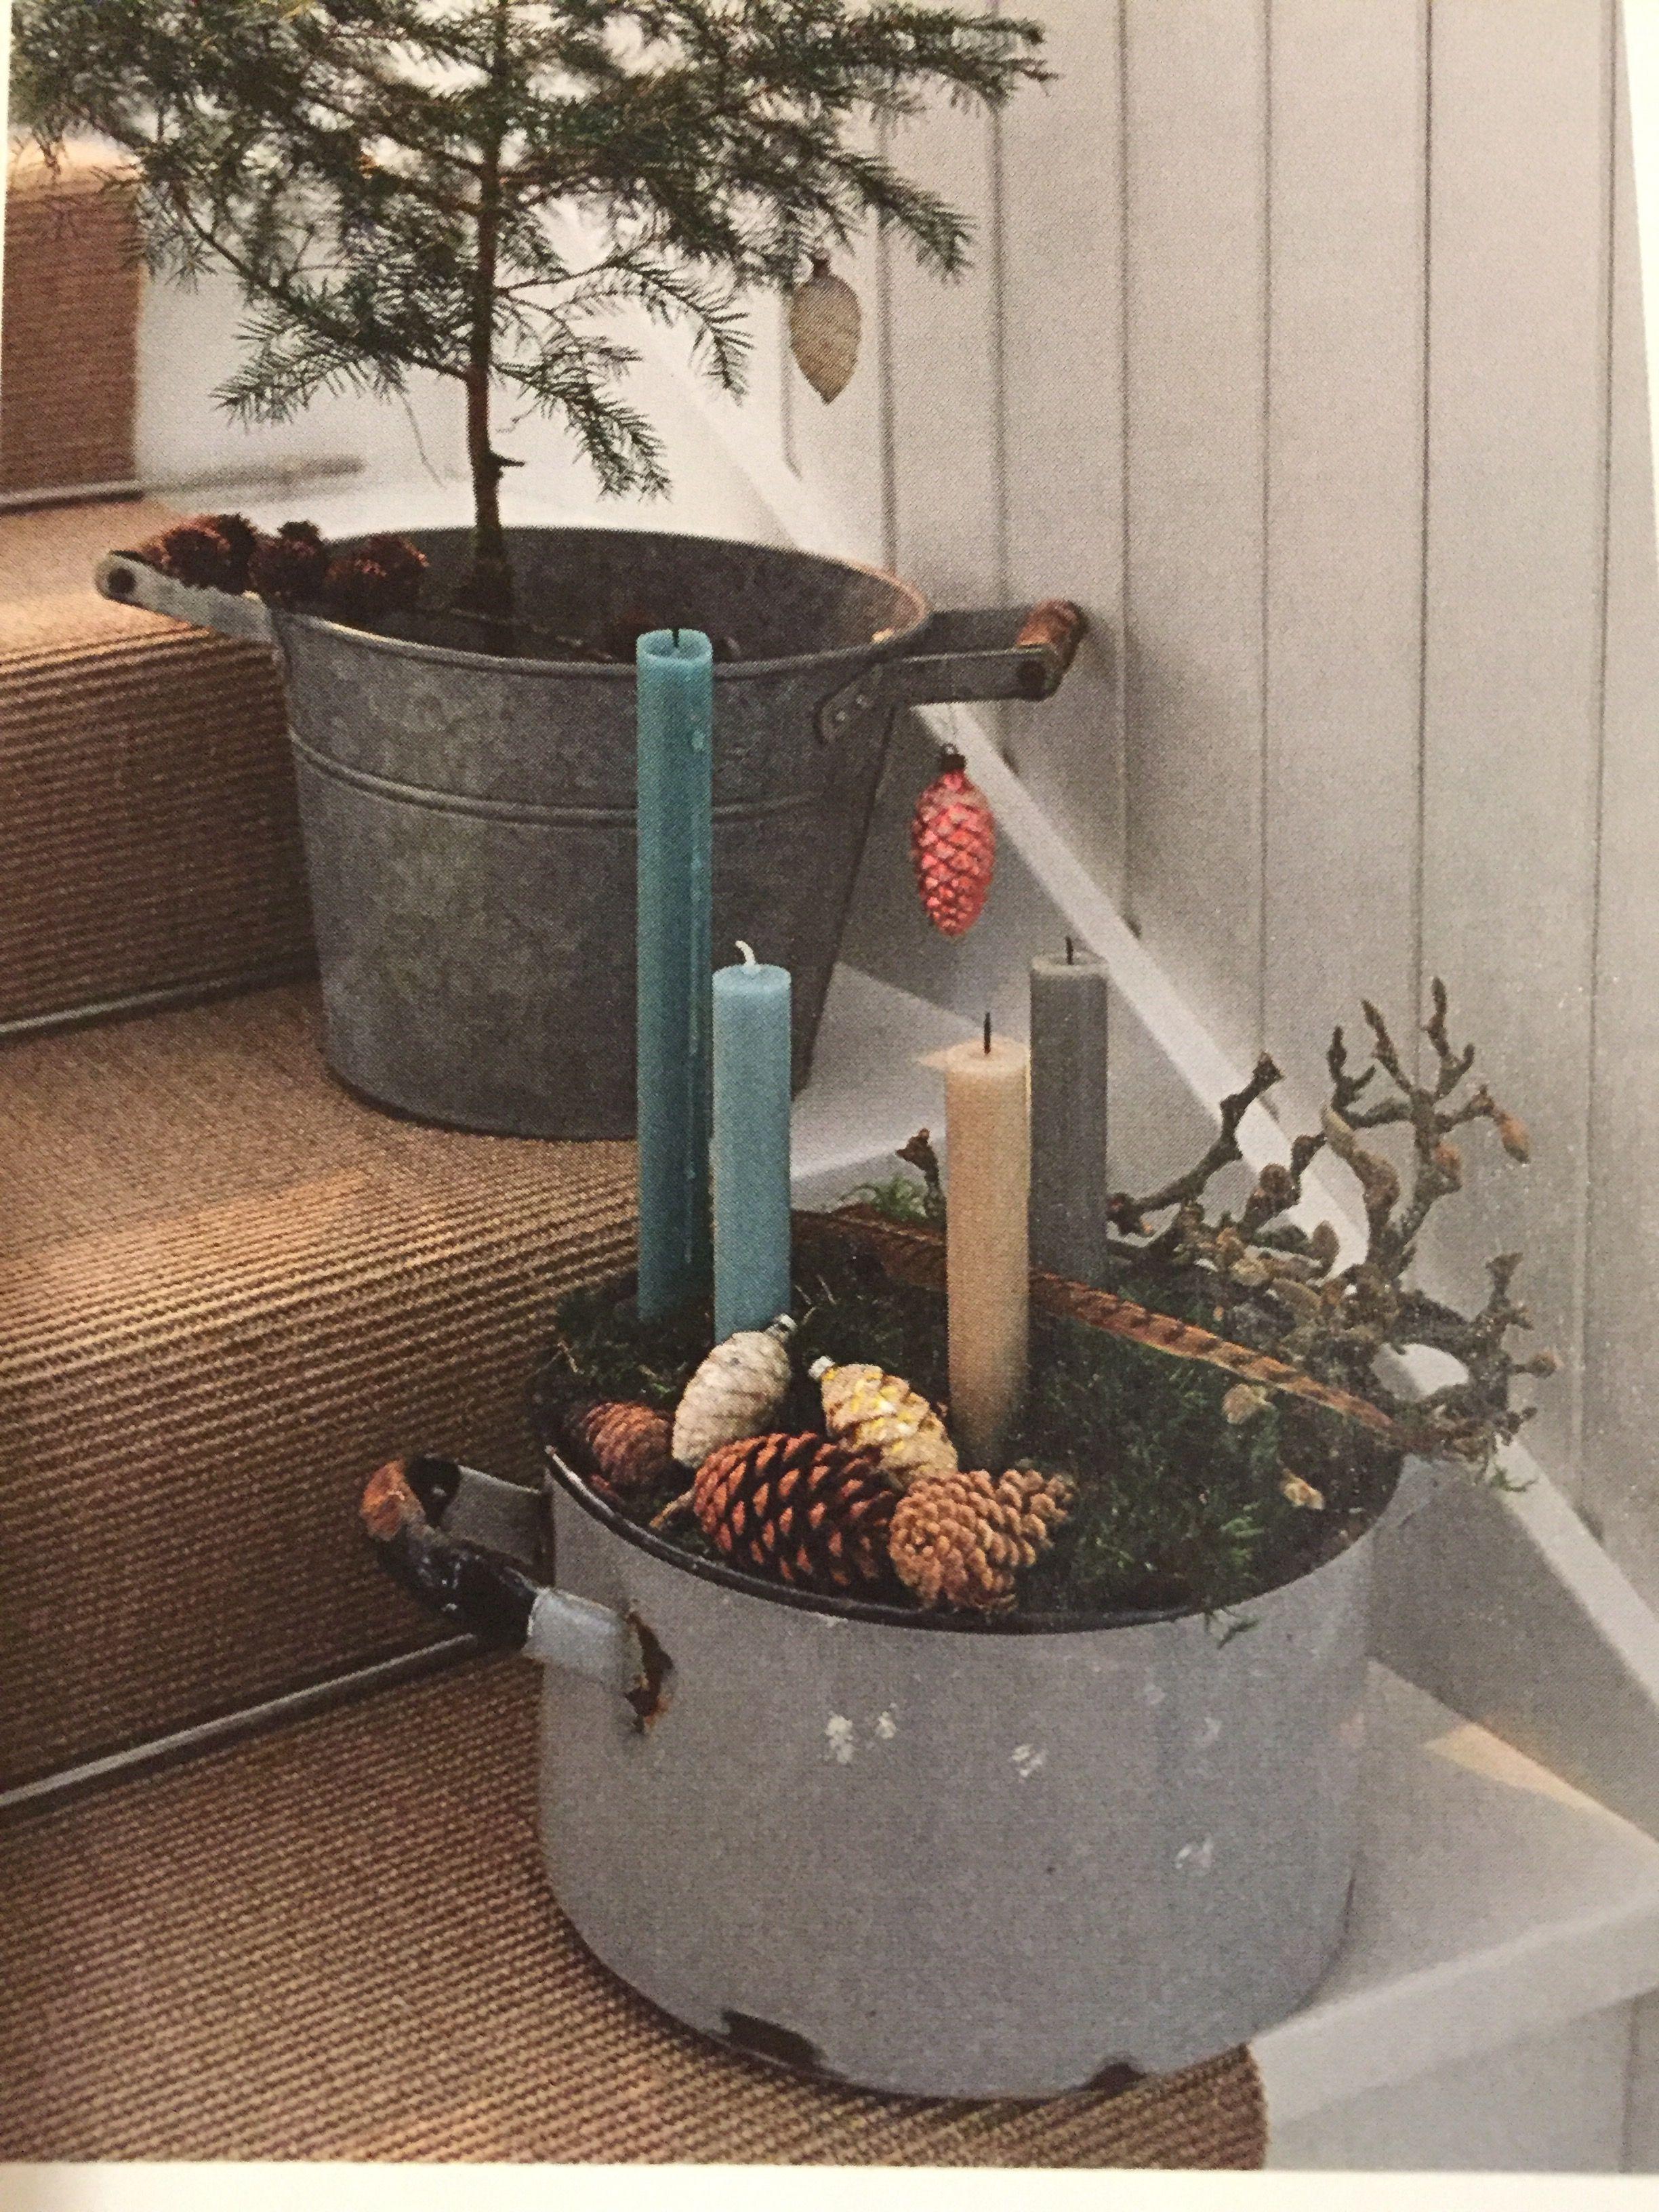 Christmas Diy, Christmas Decorations, Greenery, Diy Ideas, Christmas Ornaments, Candles,